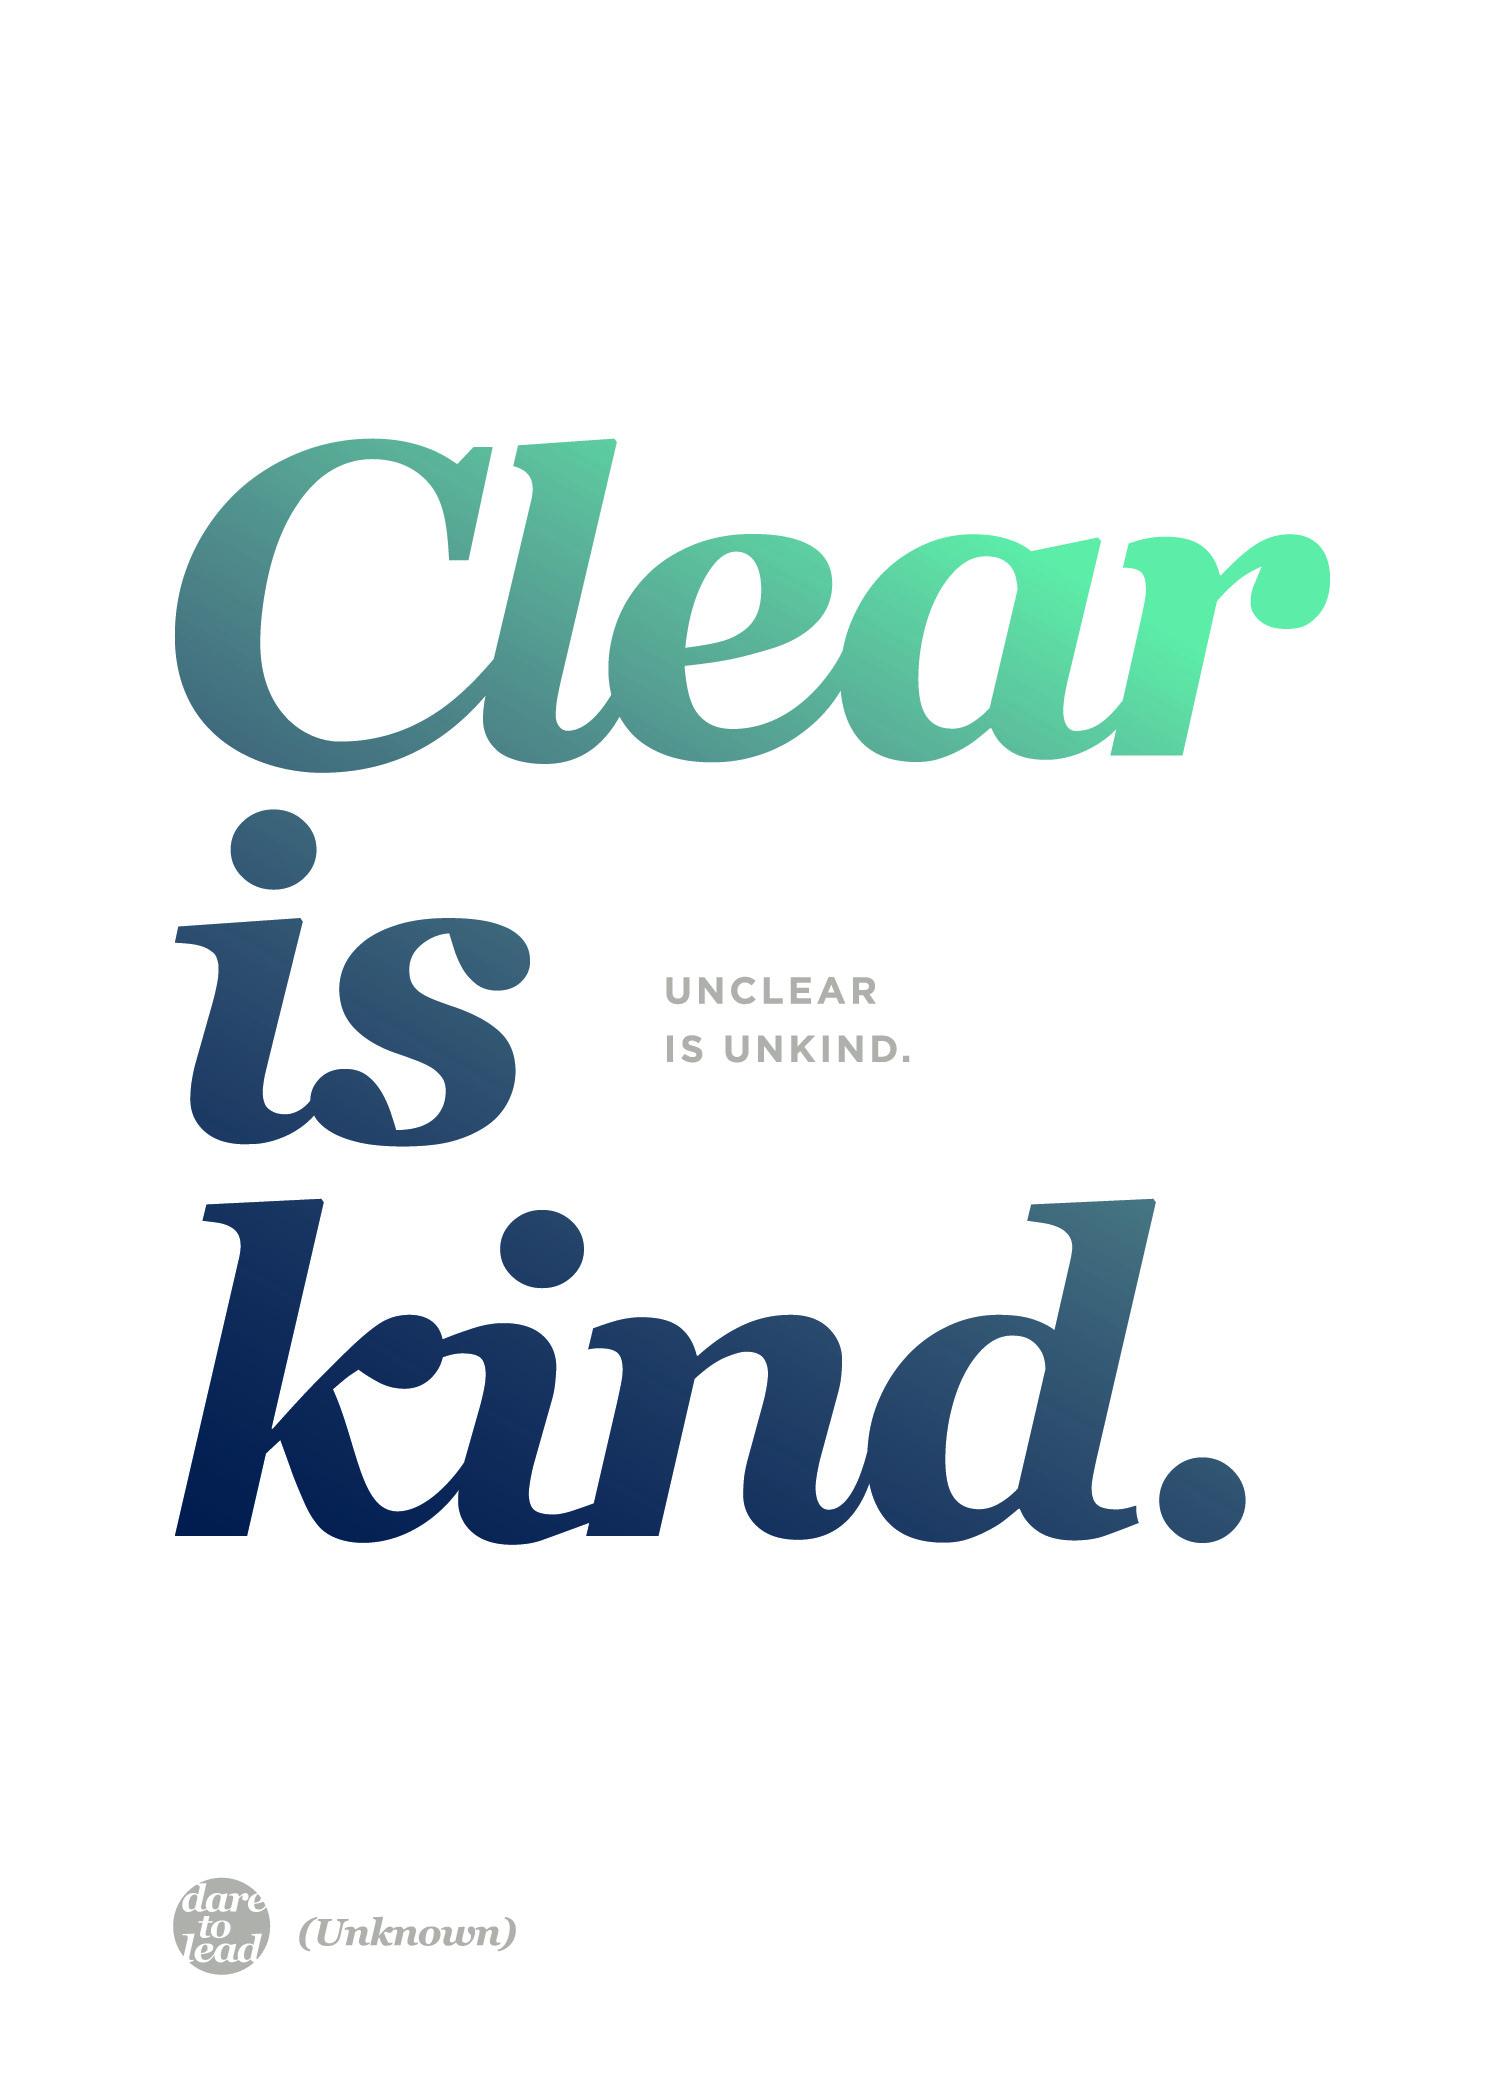 Art-Prints-Clear-is-kind...jpg